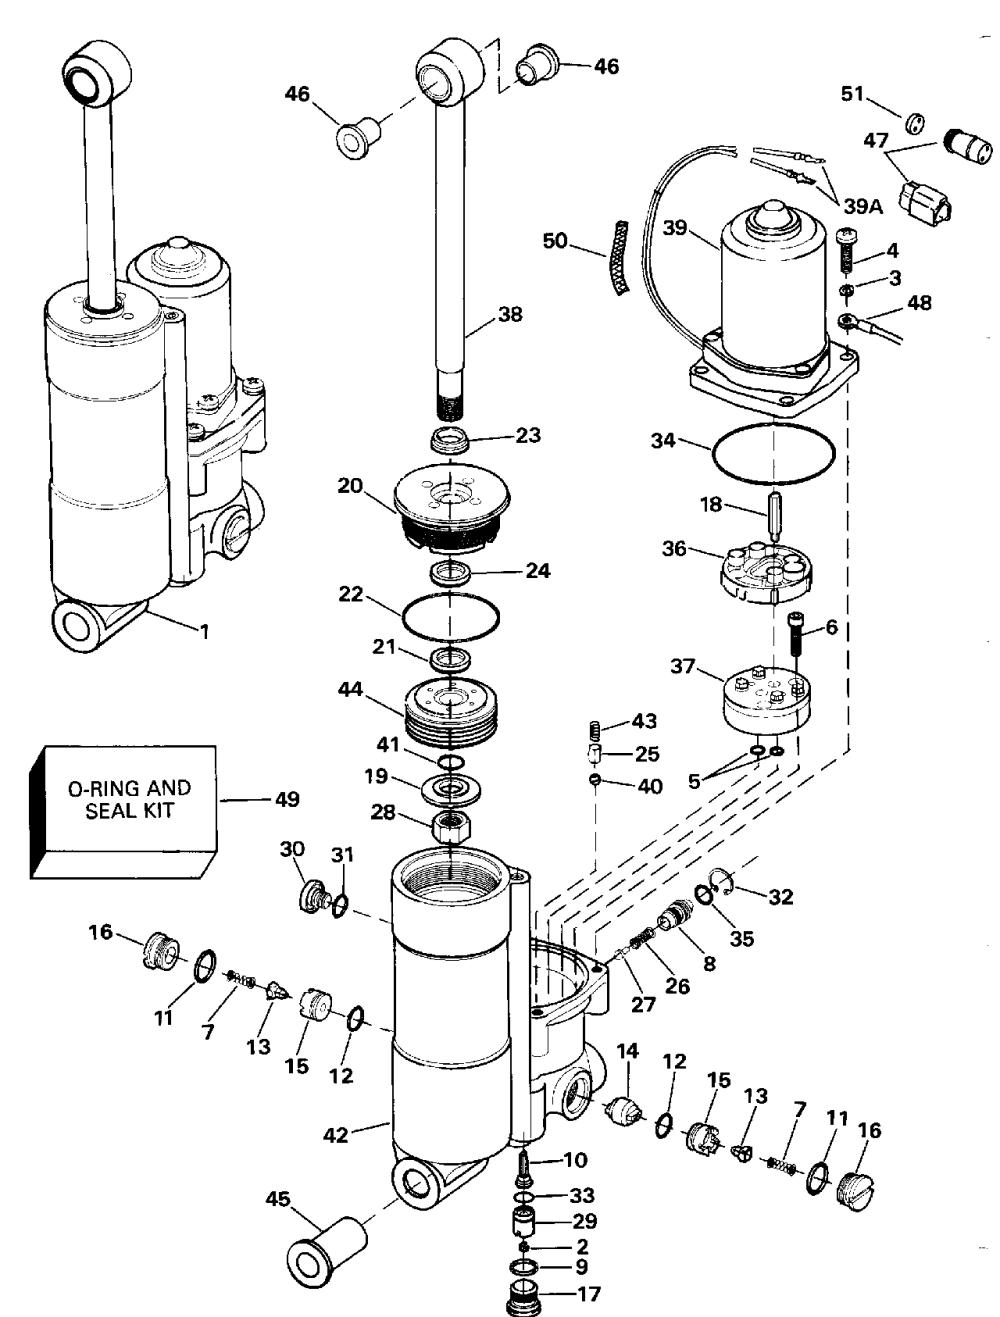 medium resolution of brp johnson en 1992 40 tj40elenm 1992 power tilt trim